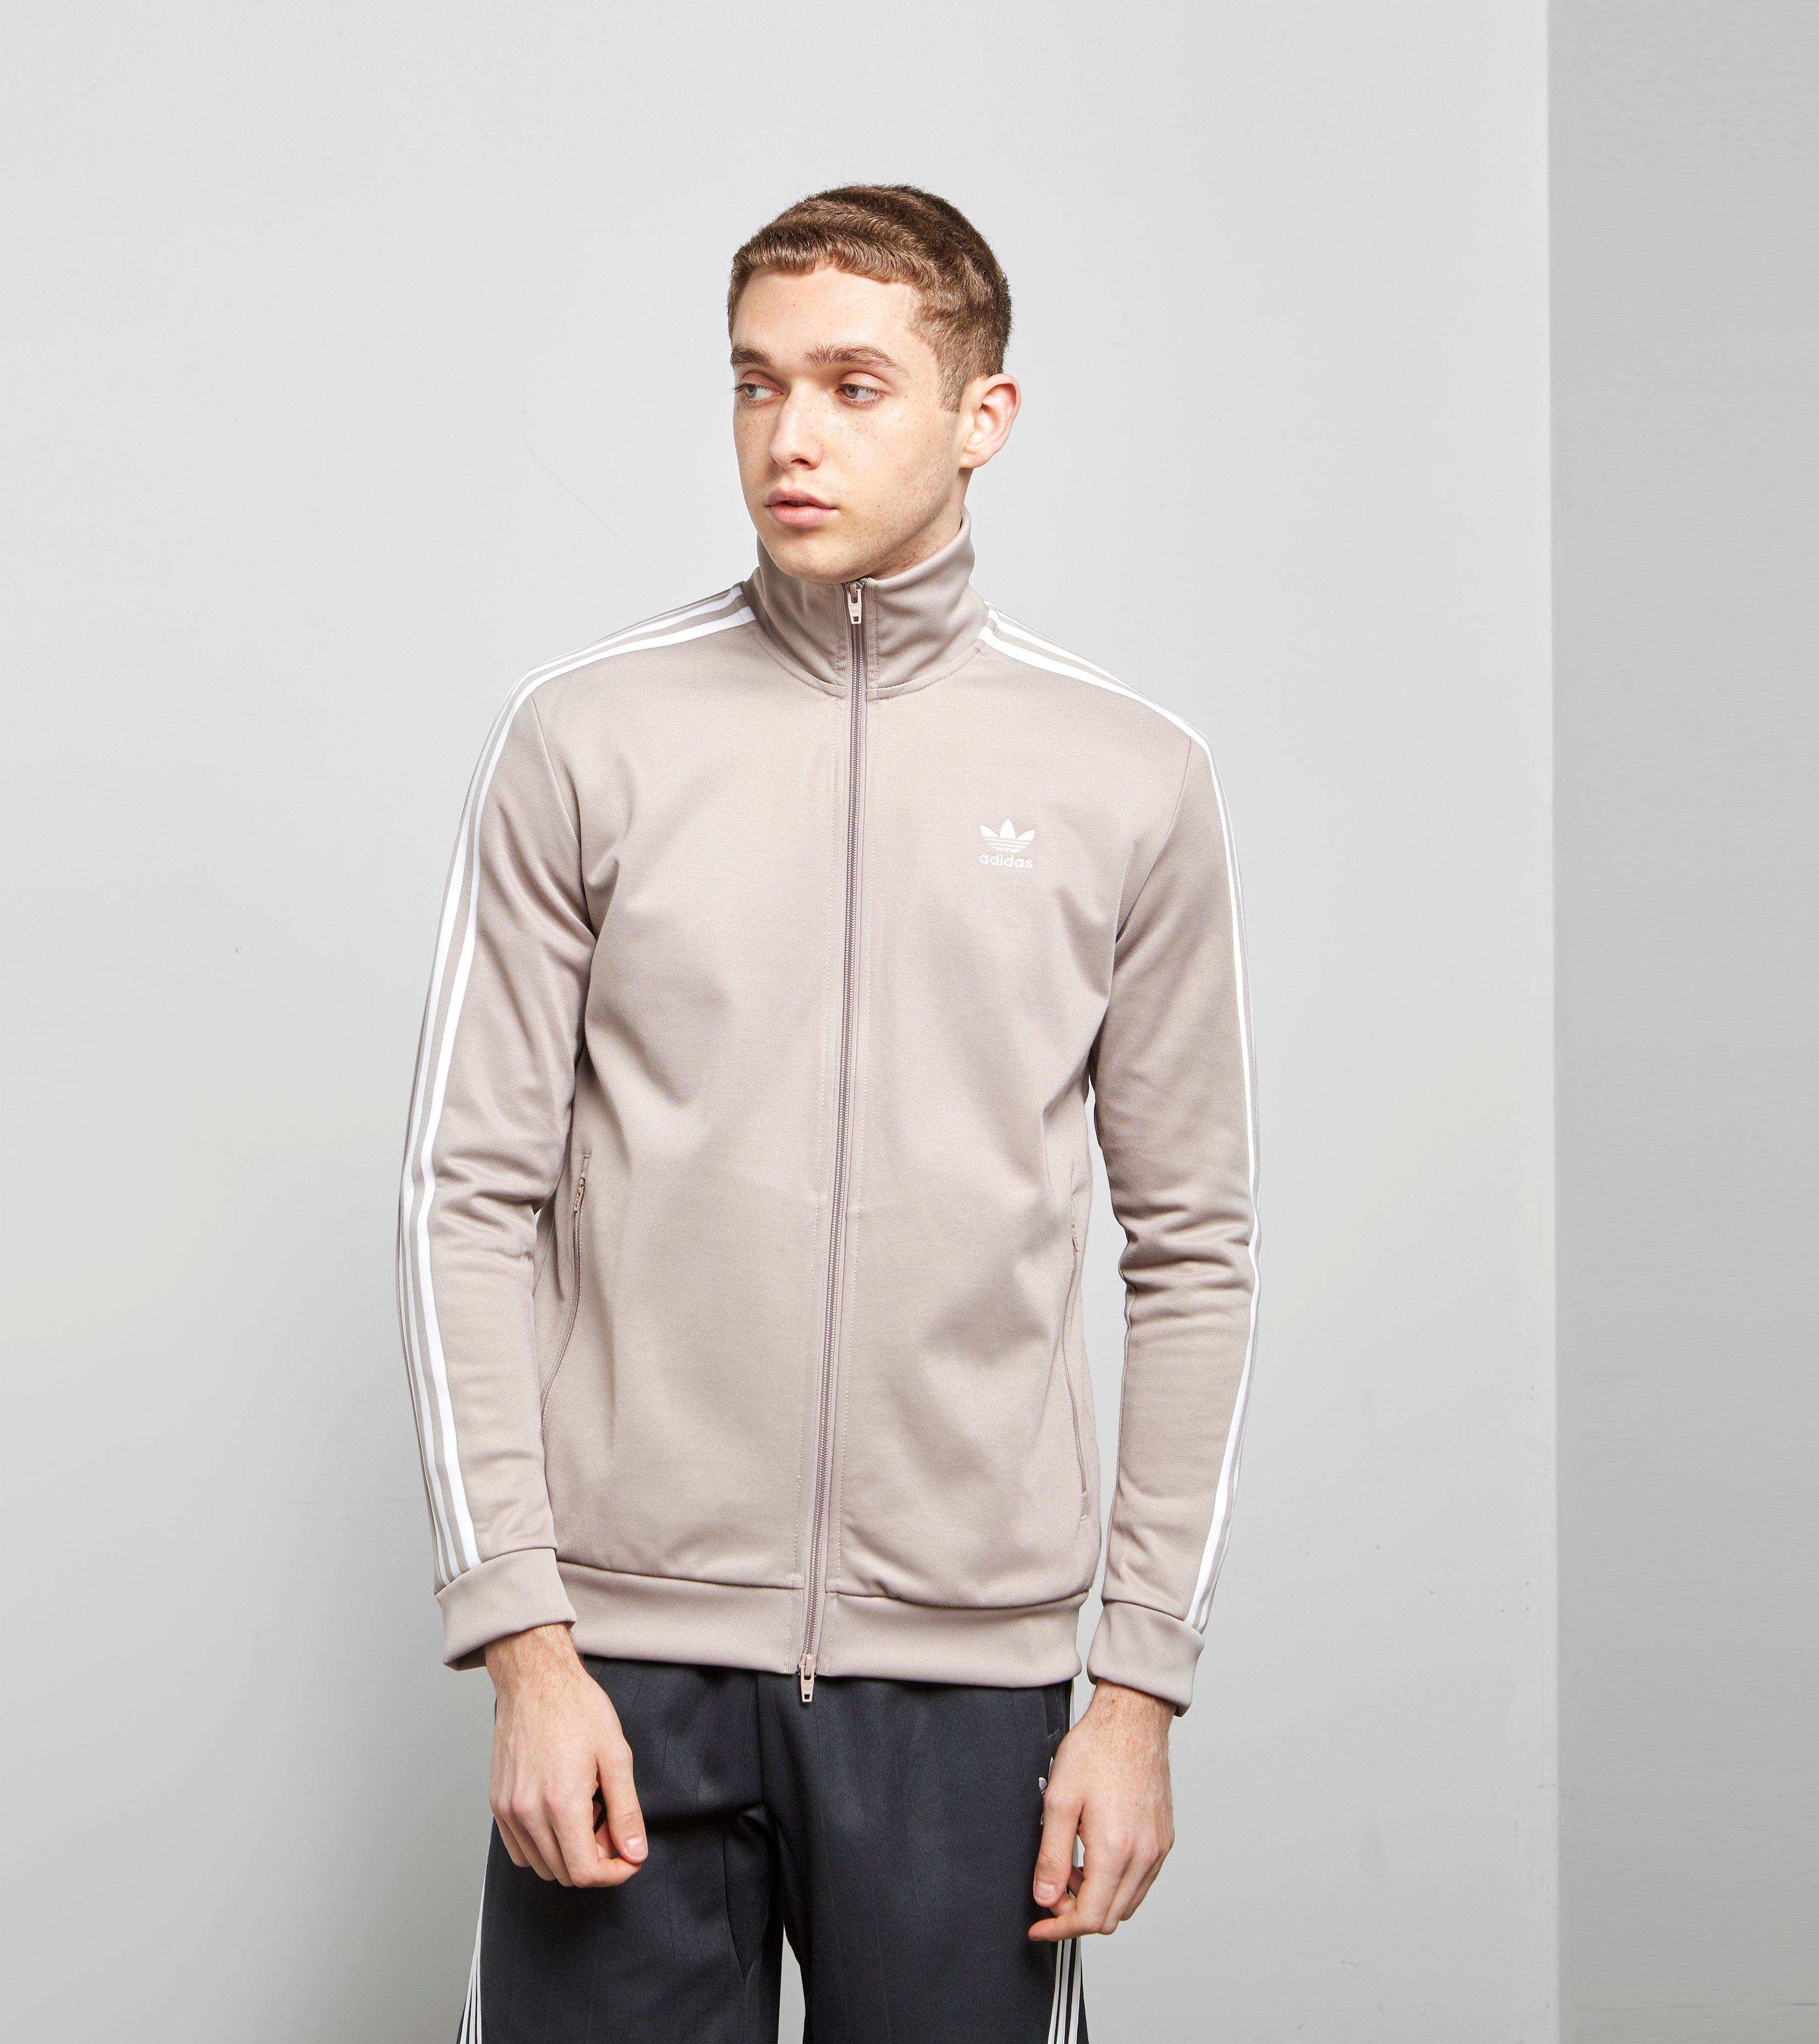 12ea1b063e13 Lyst - Adidas Originals Beckenbauer Full Zip Track Top in Gray for Men